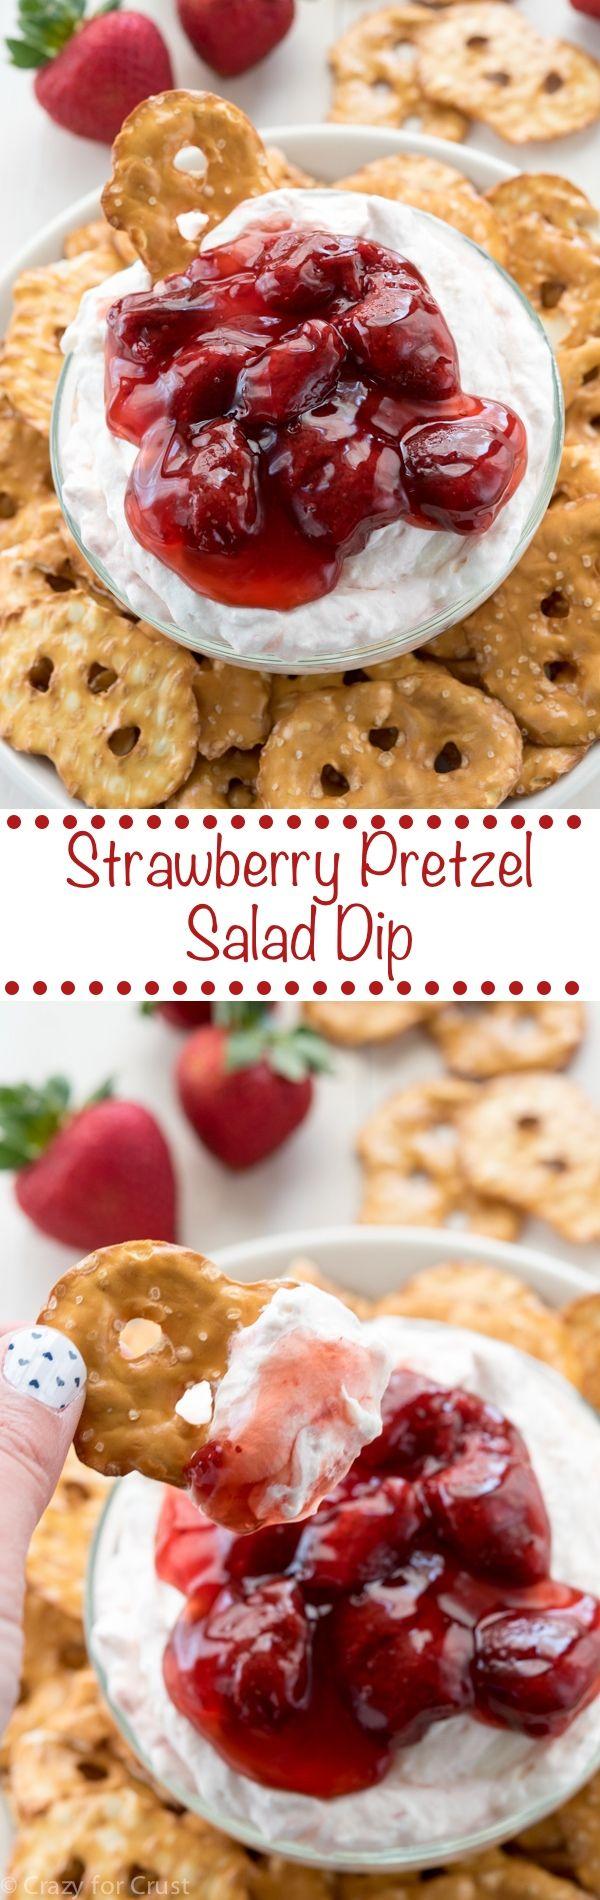 Strawberry Pretzel Salad Dip - Crazy for Crust